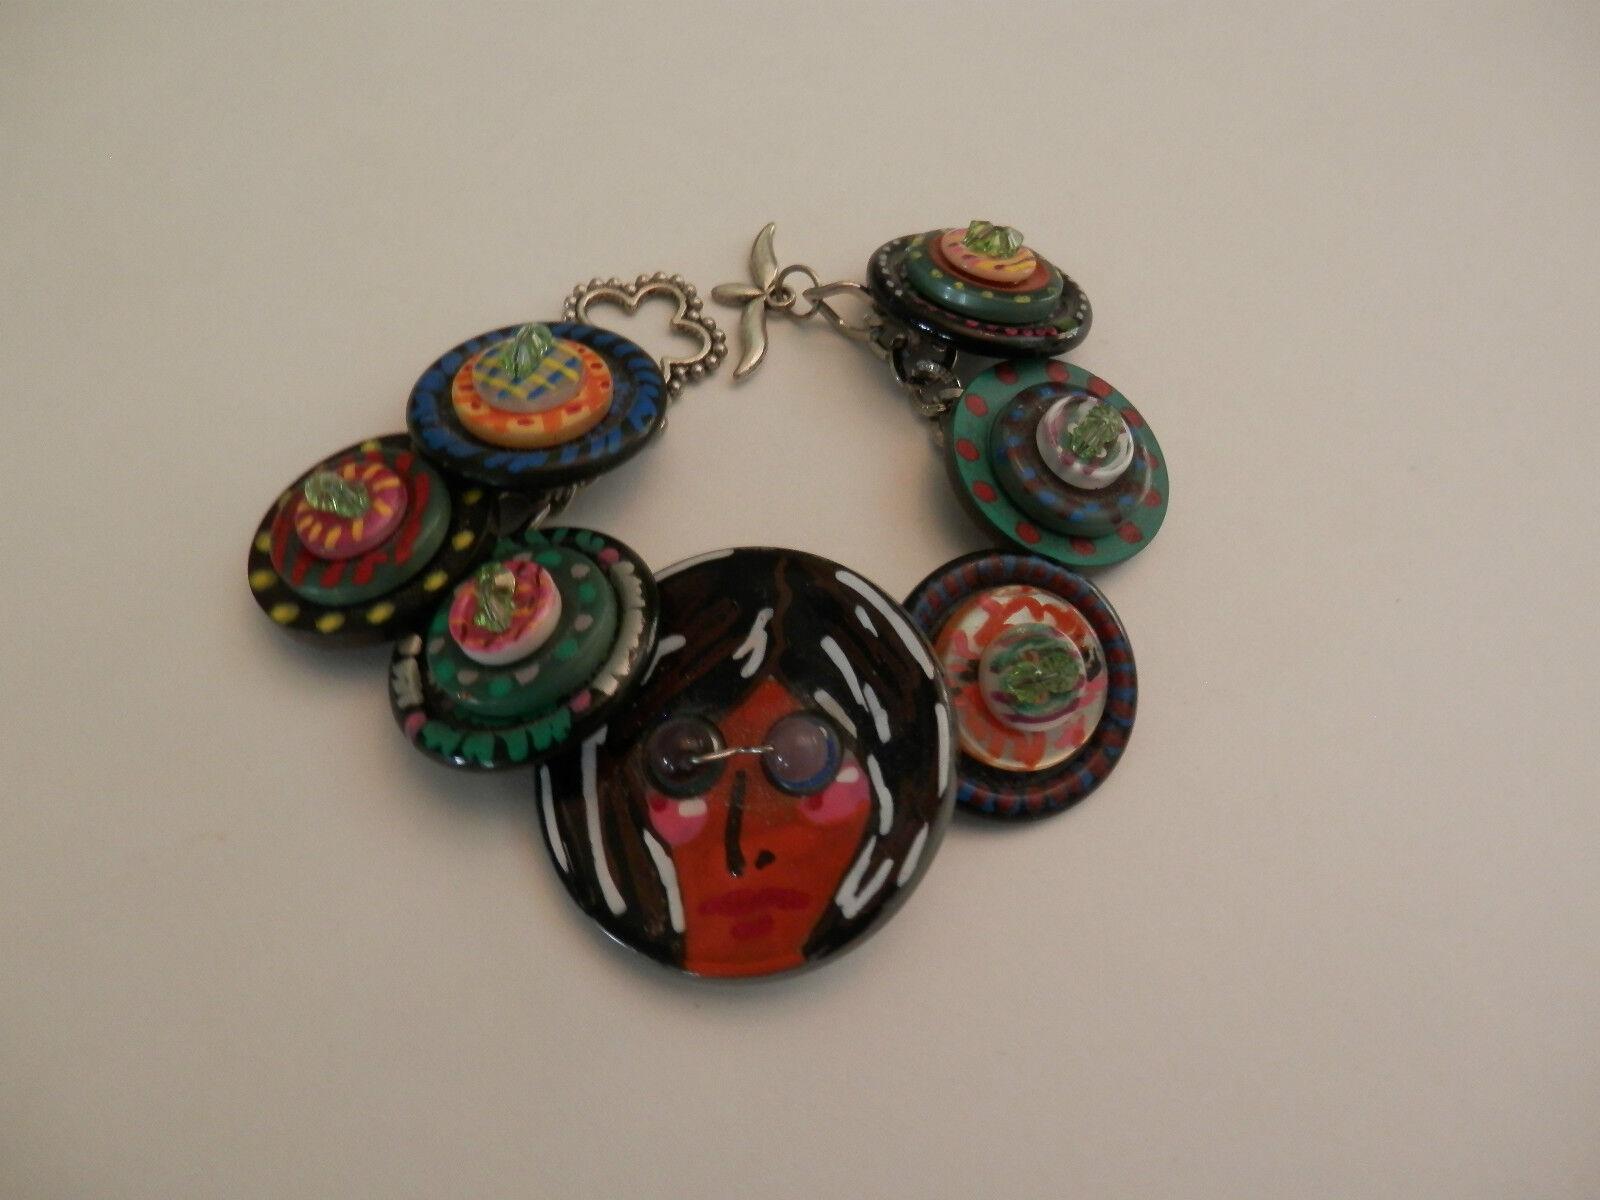 John Lennon Handcrafted Hand Painted Button Charm Bracelet   7 1 2